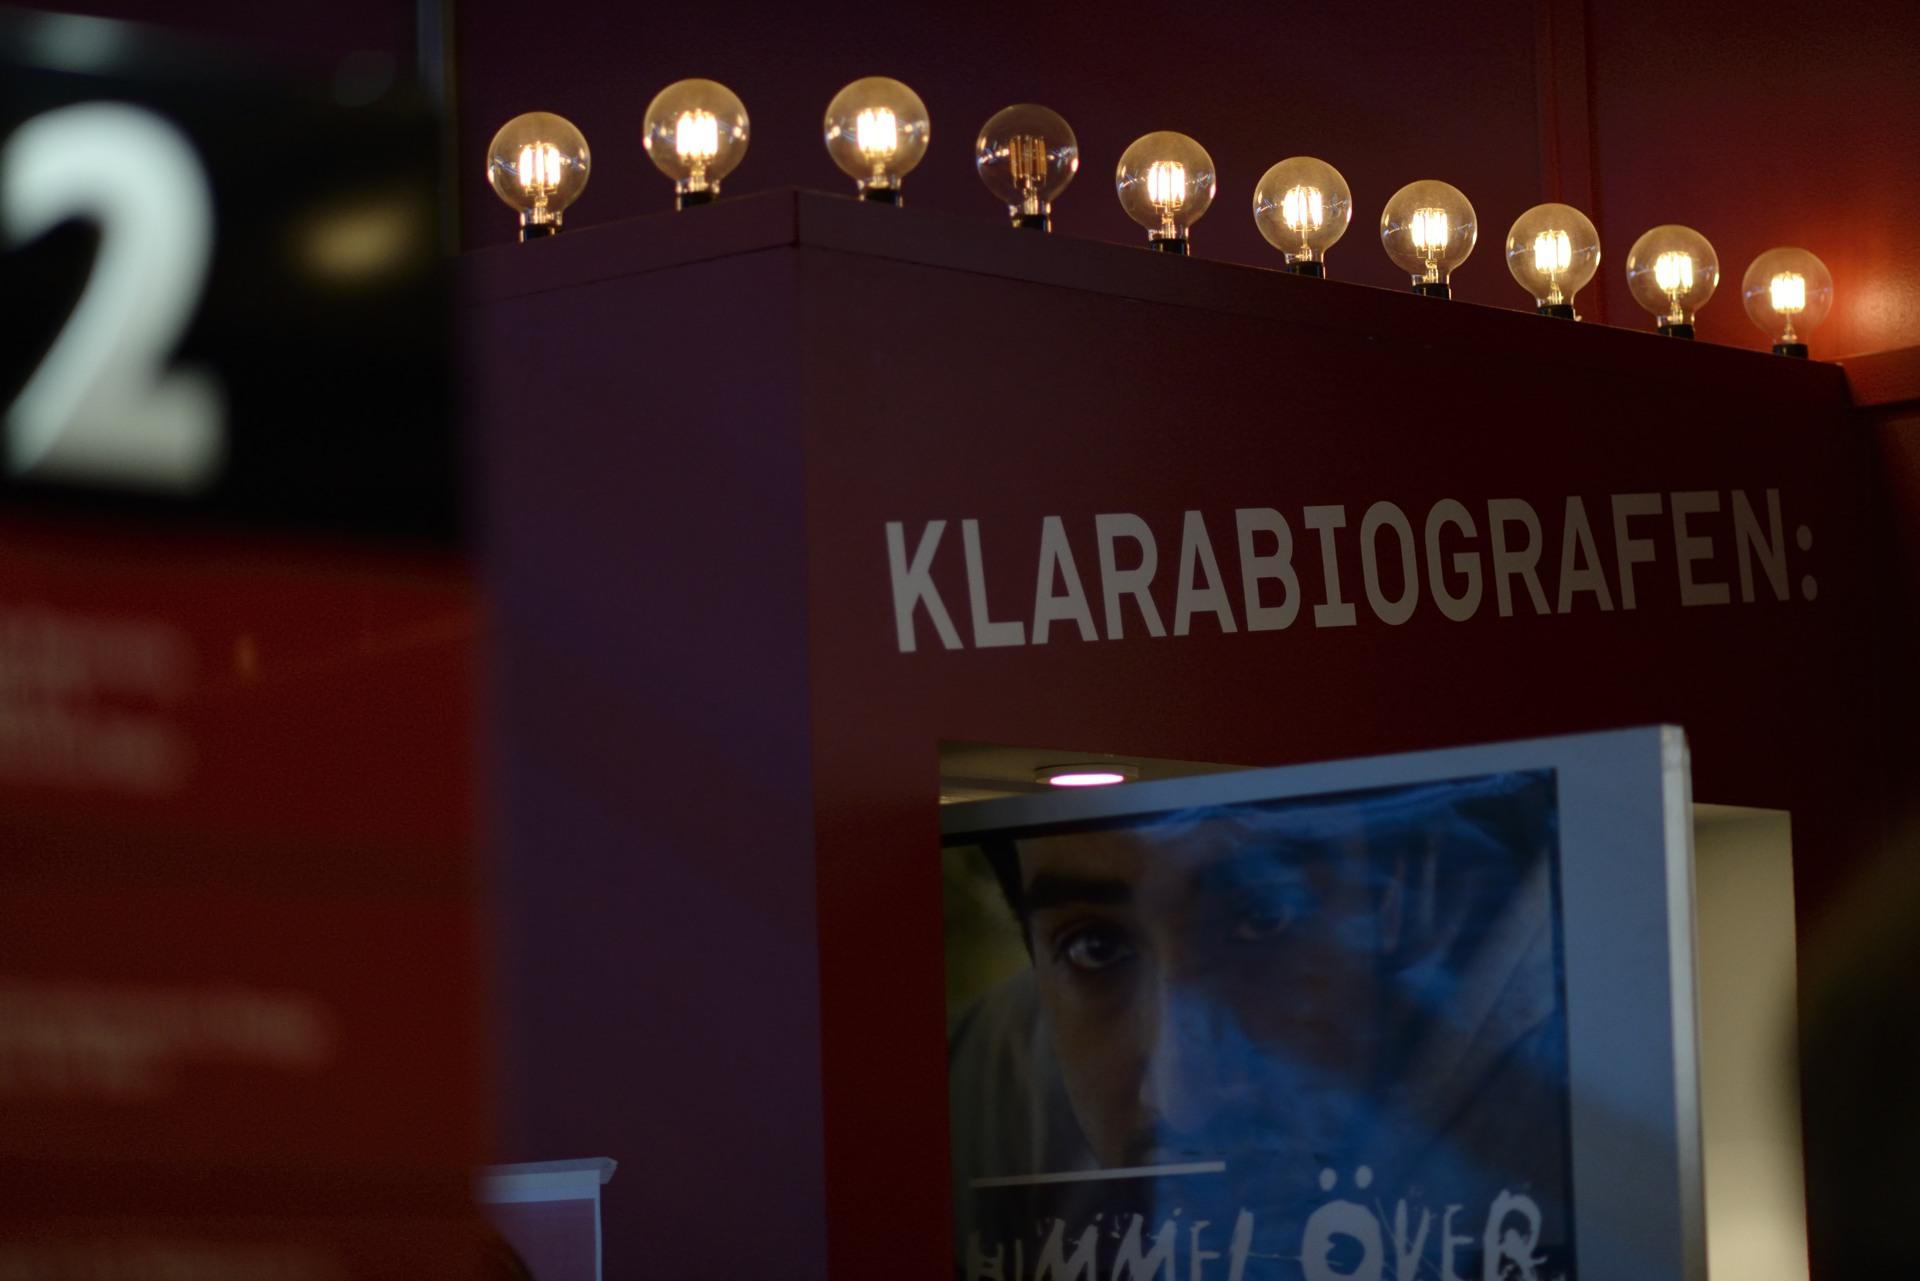 2015-11-11:007 Klarabiografen av Magnus Norden